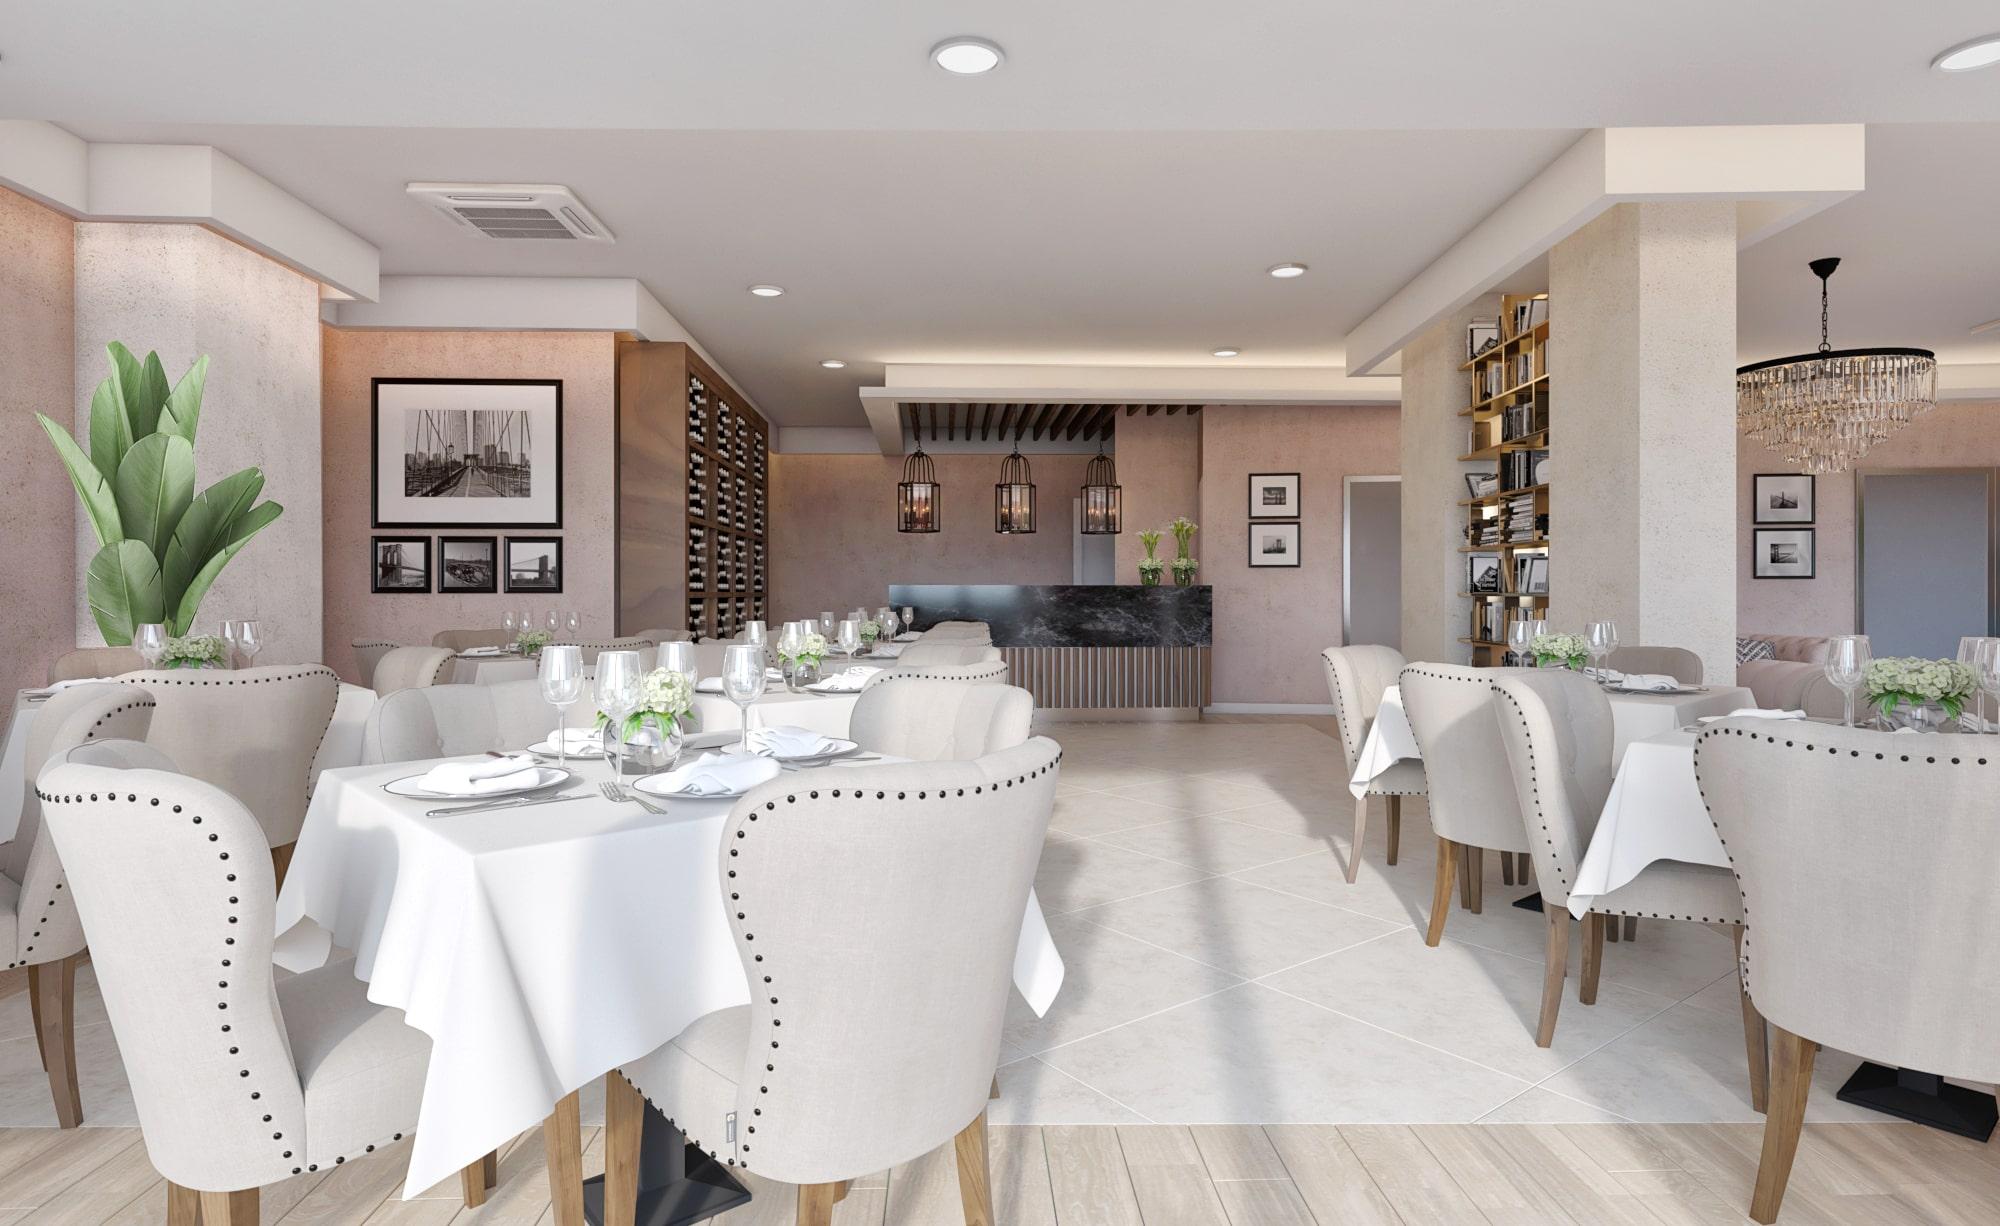 Restaurant in Montenegro ANATOLIA Lounge Cafe Becici - Budva 5.jpg